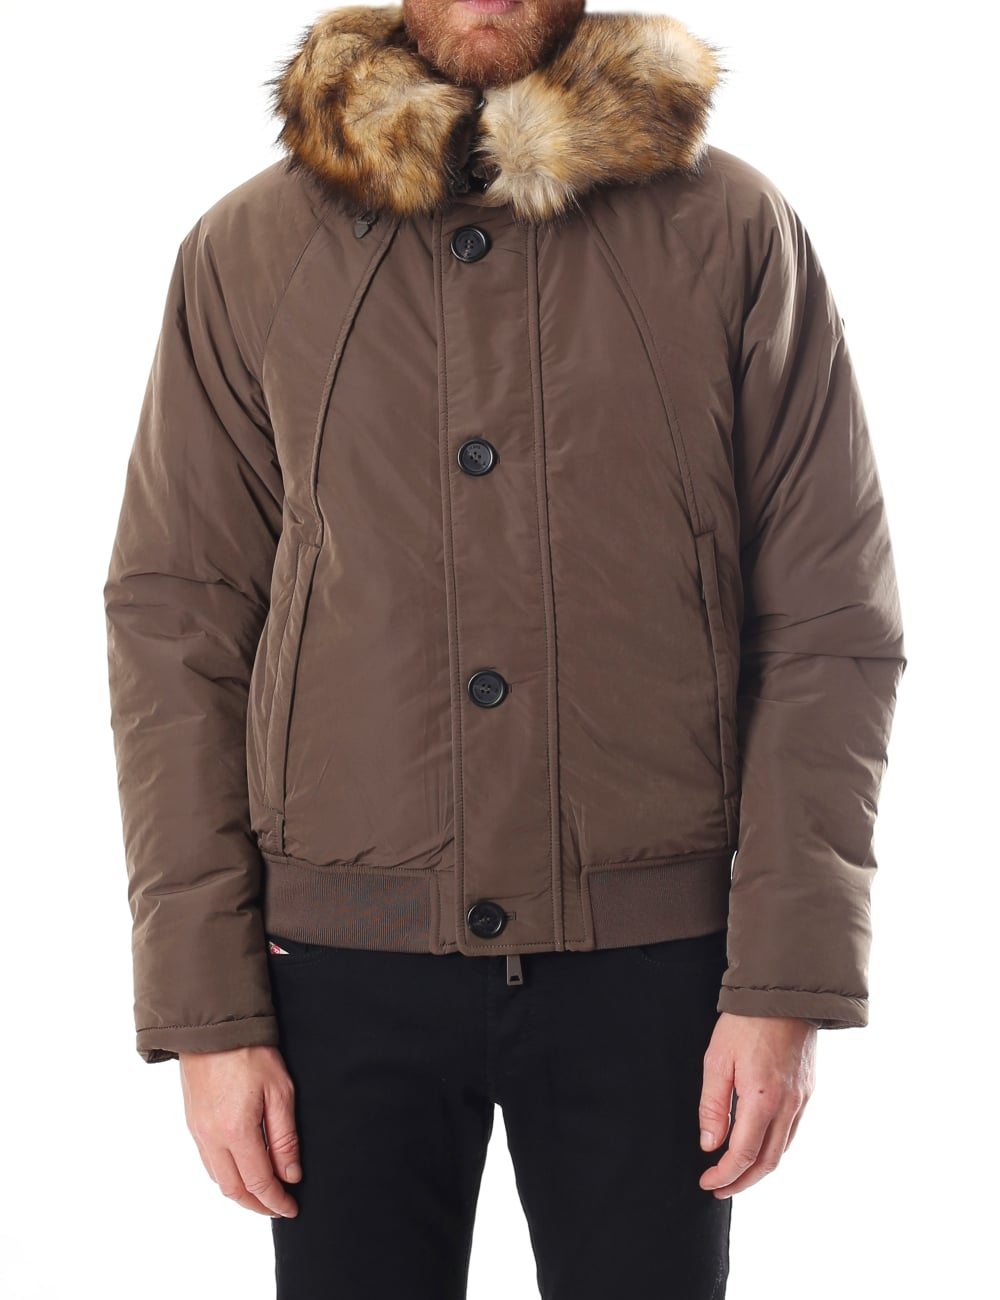 219fdc58 Faux Fur Trim Men's Bomber Jacket